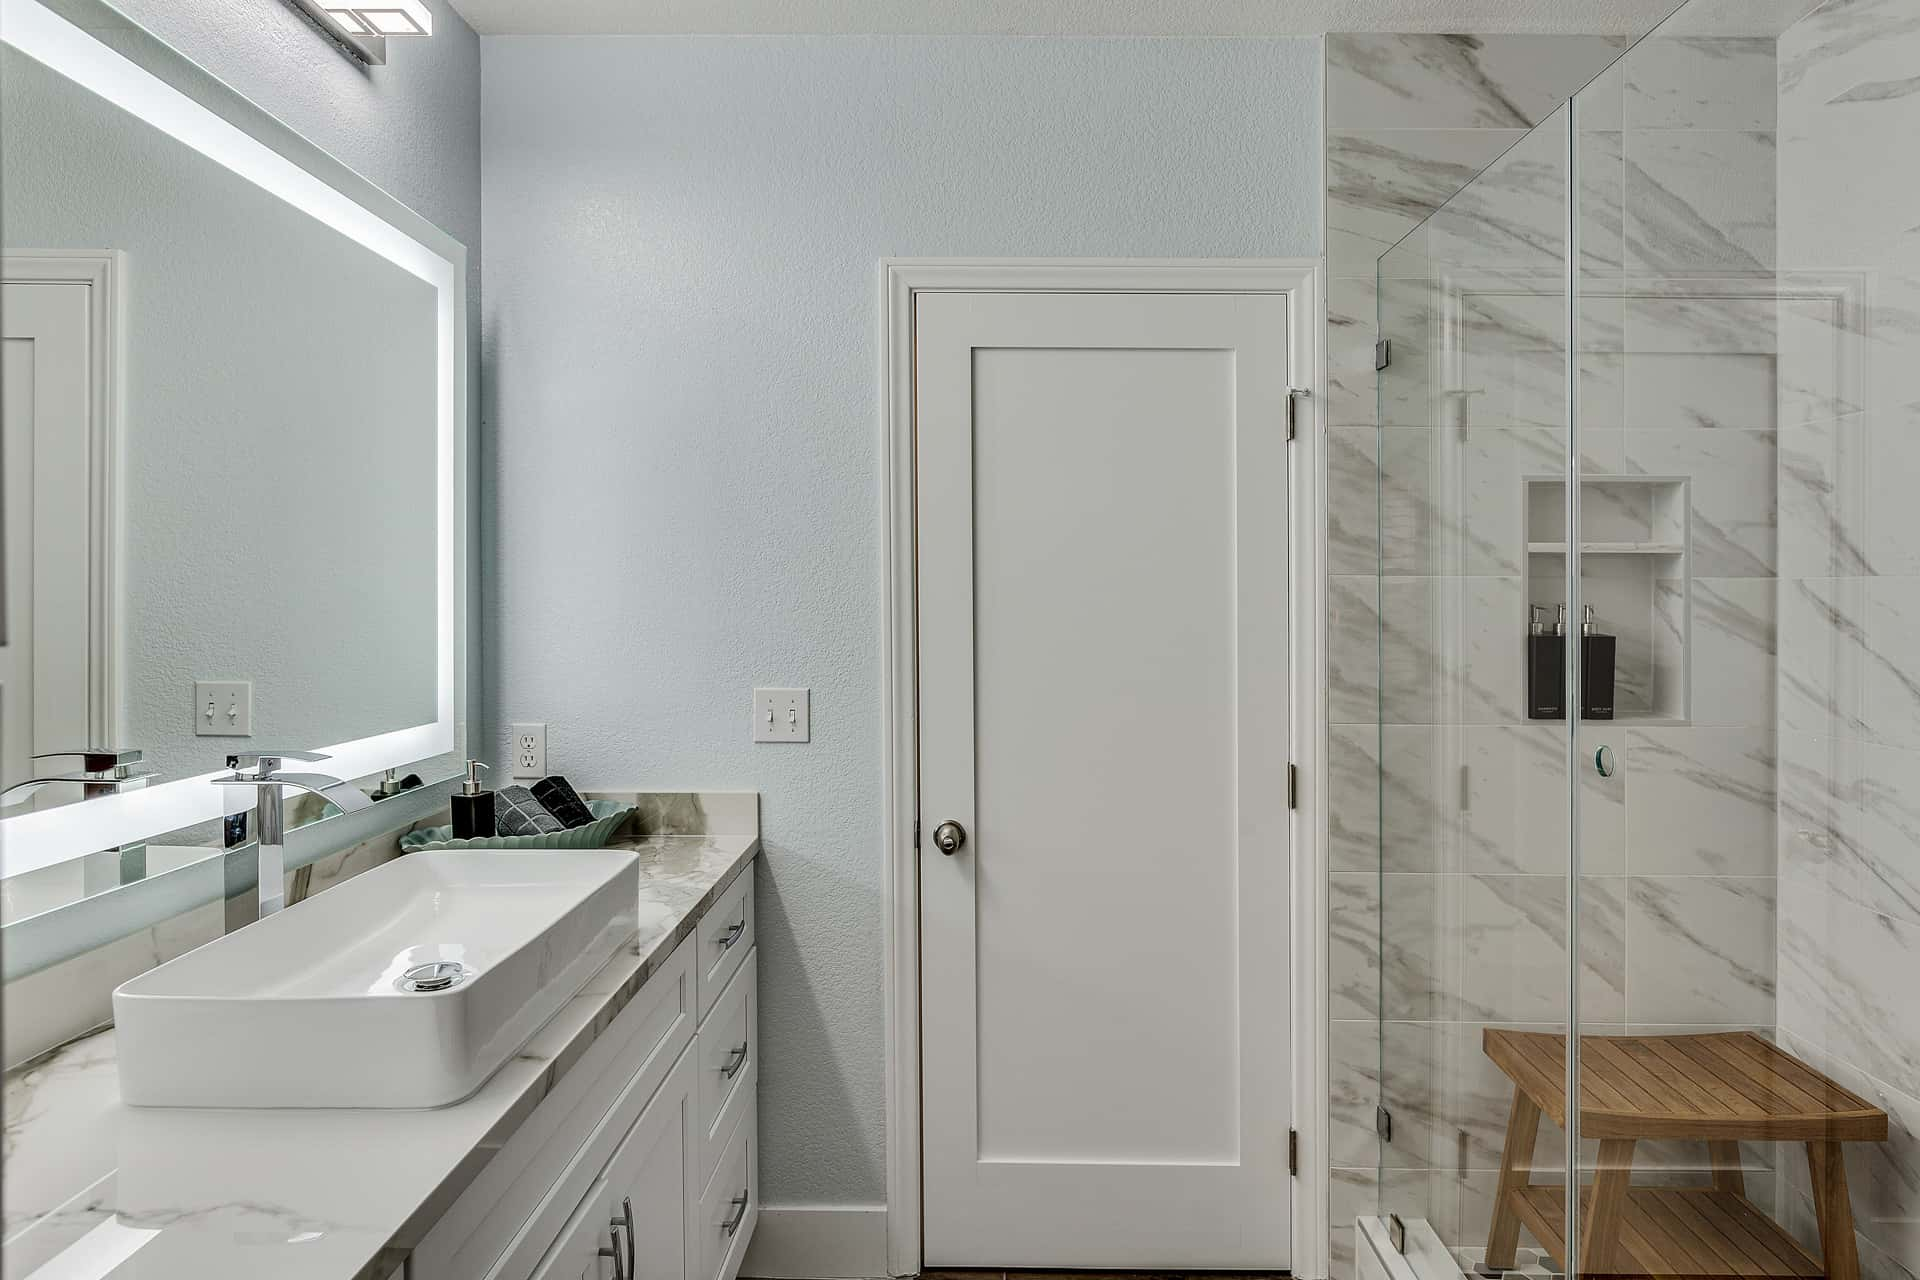 secondary bathroom and shower